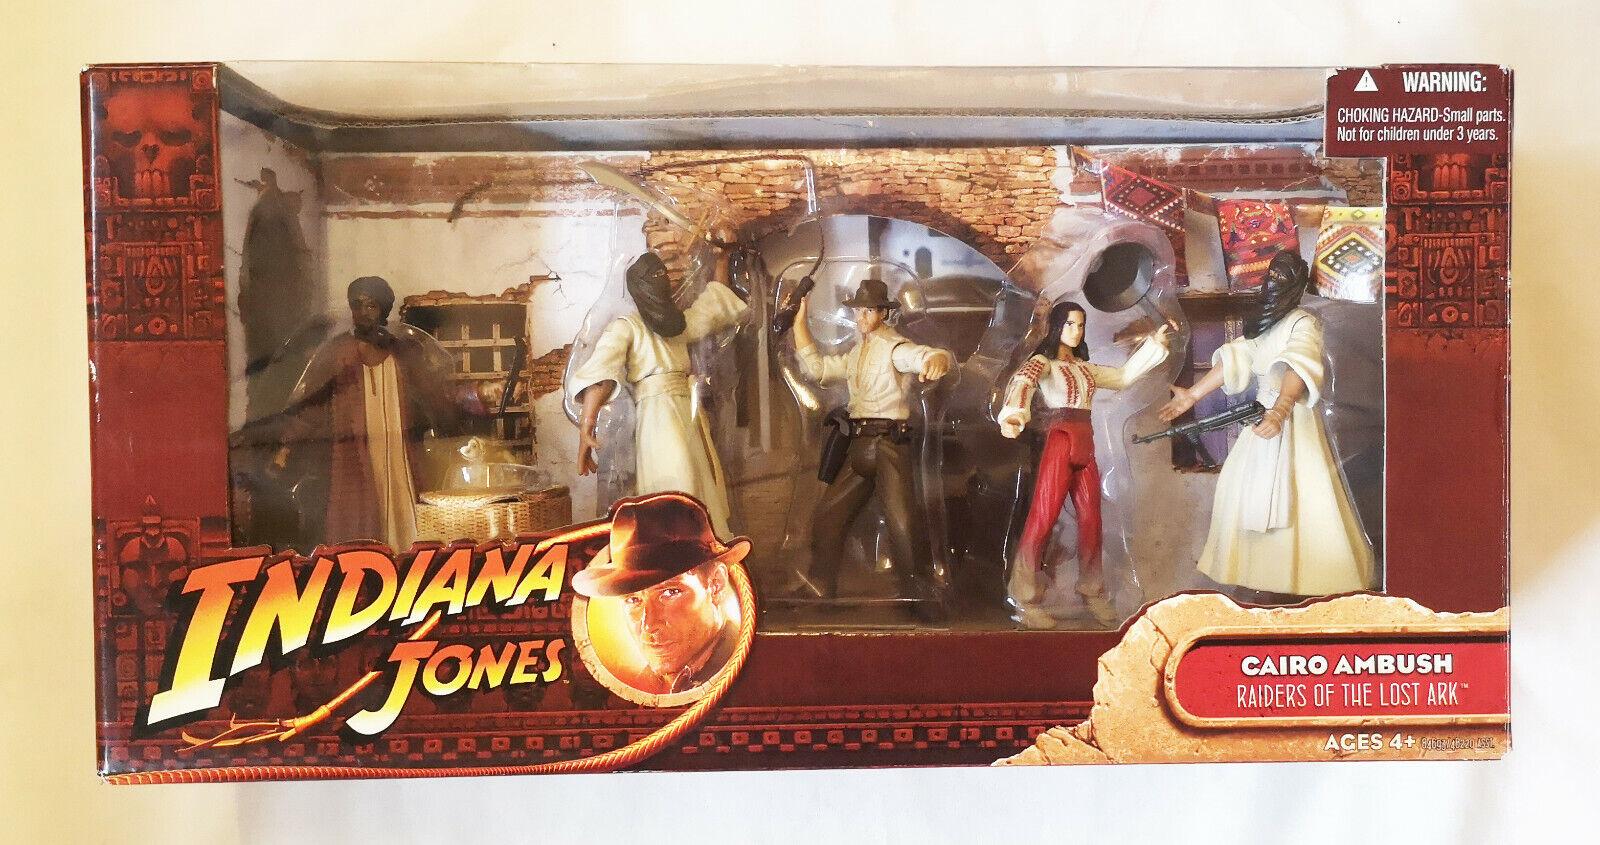 Indiana Jones Cairo Ambush Action figures set 3.75 scale